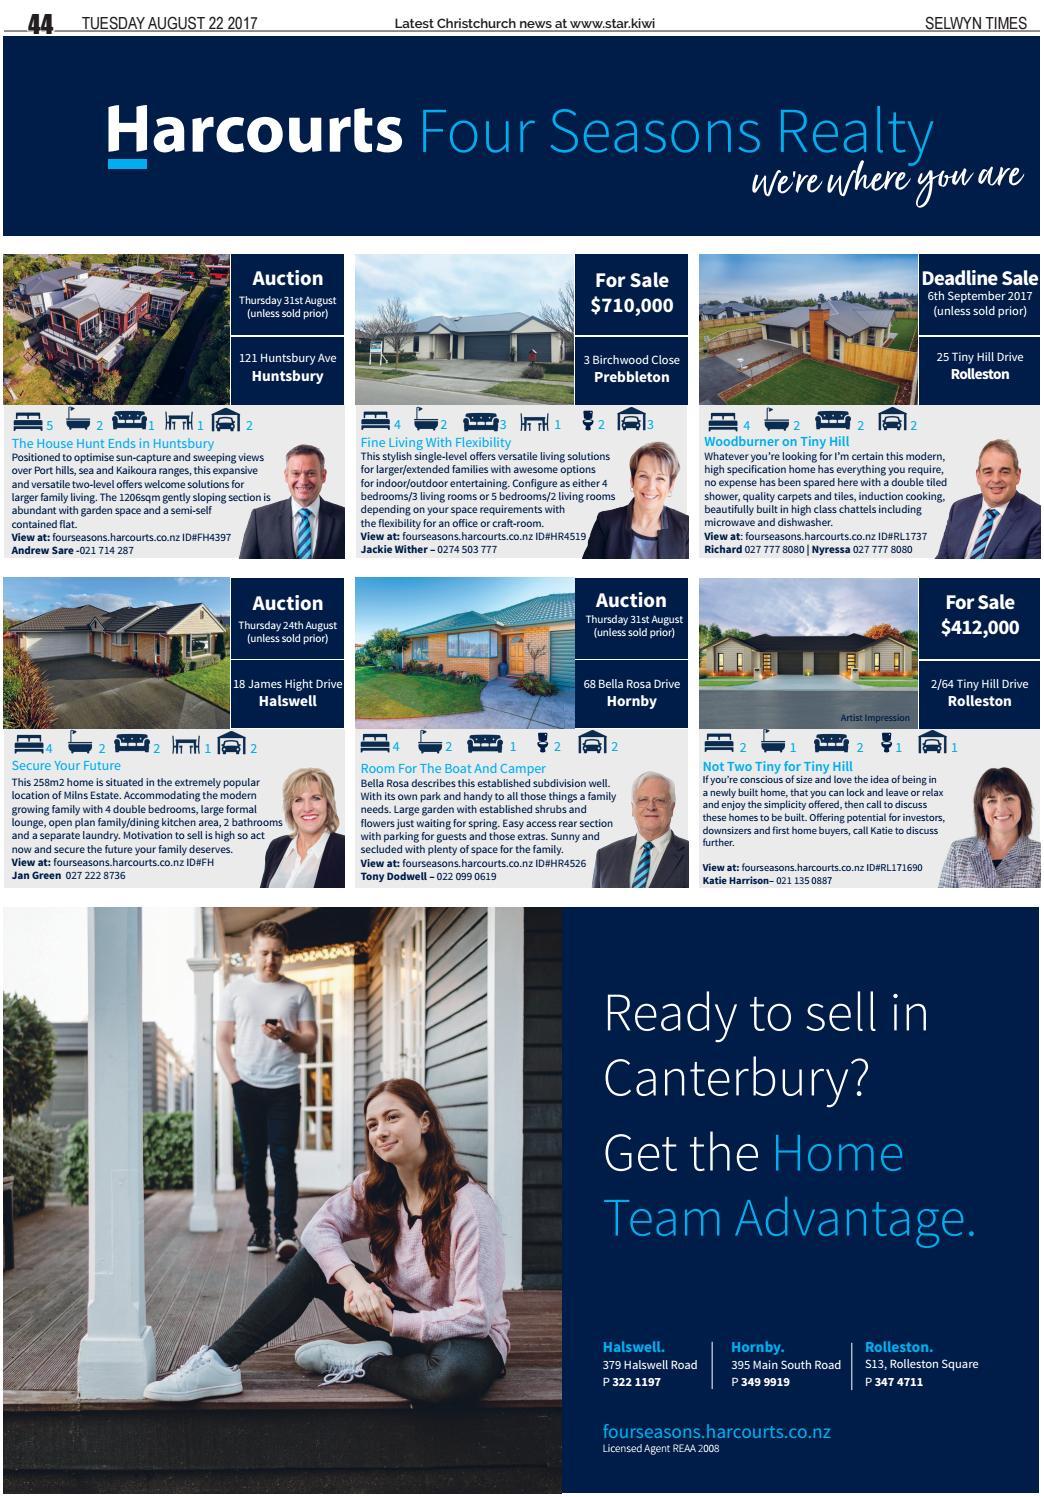 Selwyn Times 22-08-17 by Local Newspapers - issuu